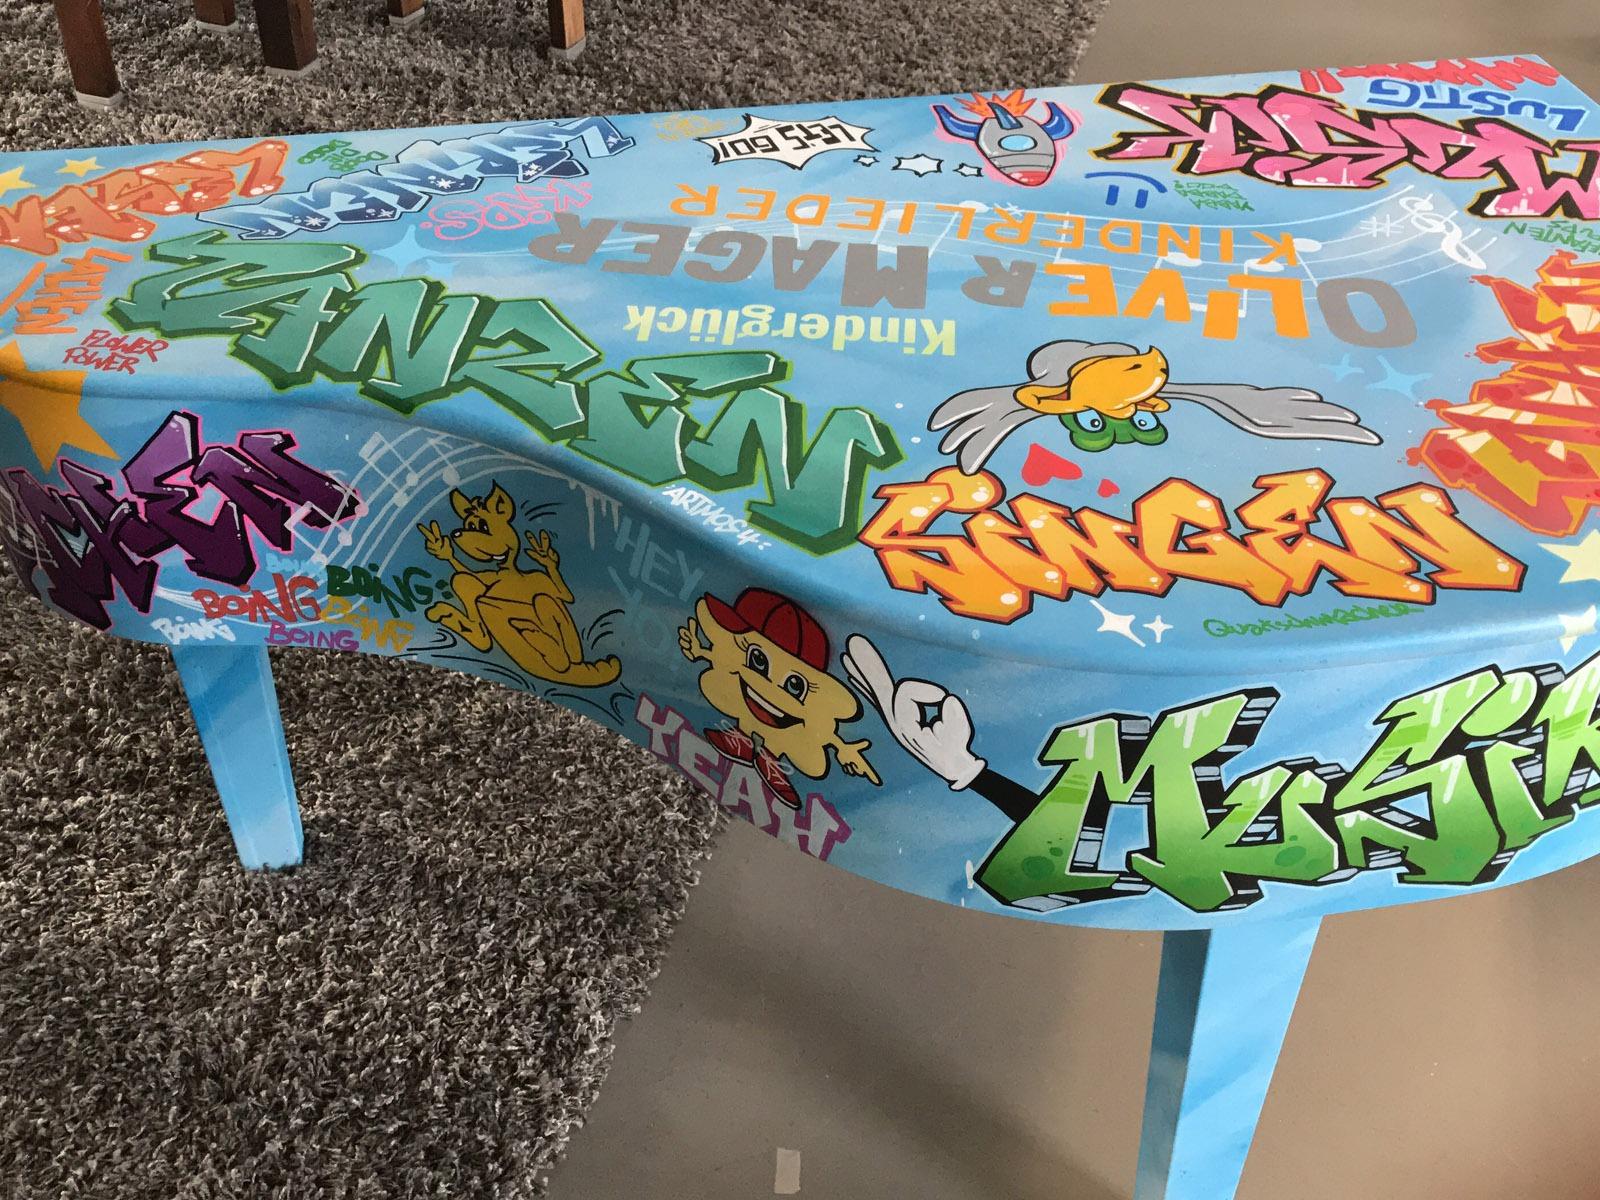 graffitiauftrag-graffitikuenstler-artmos4-graffiti-klavier